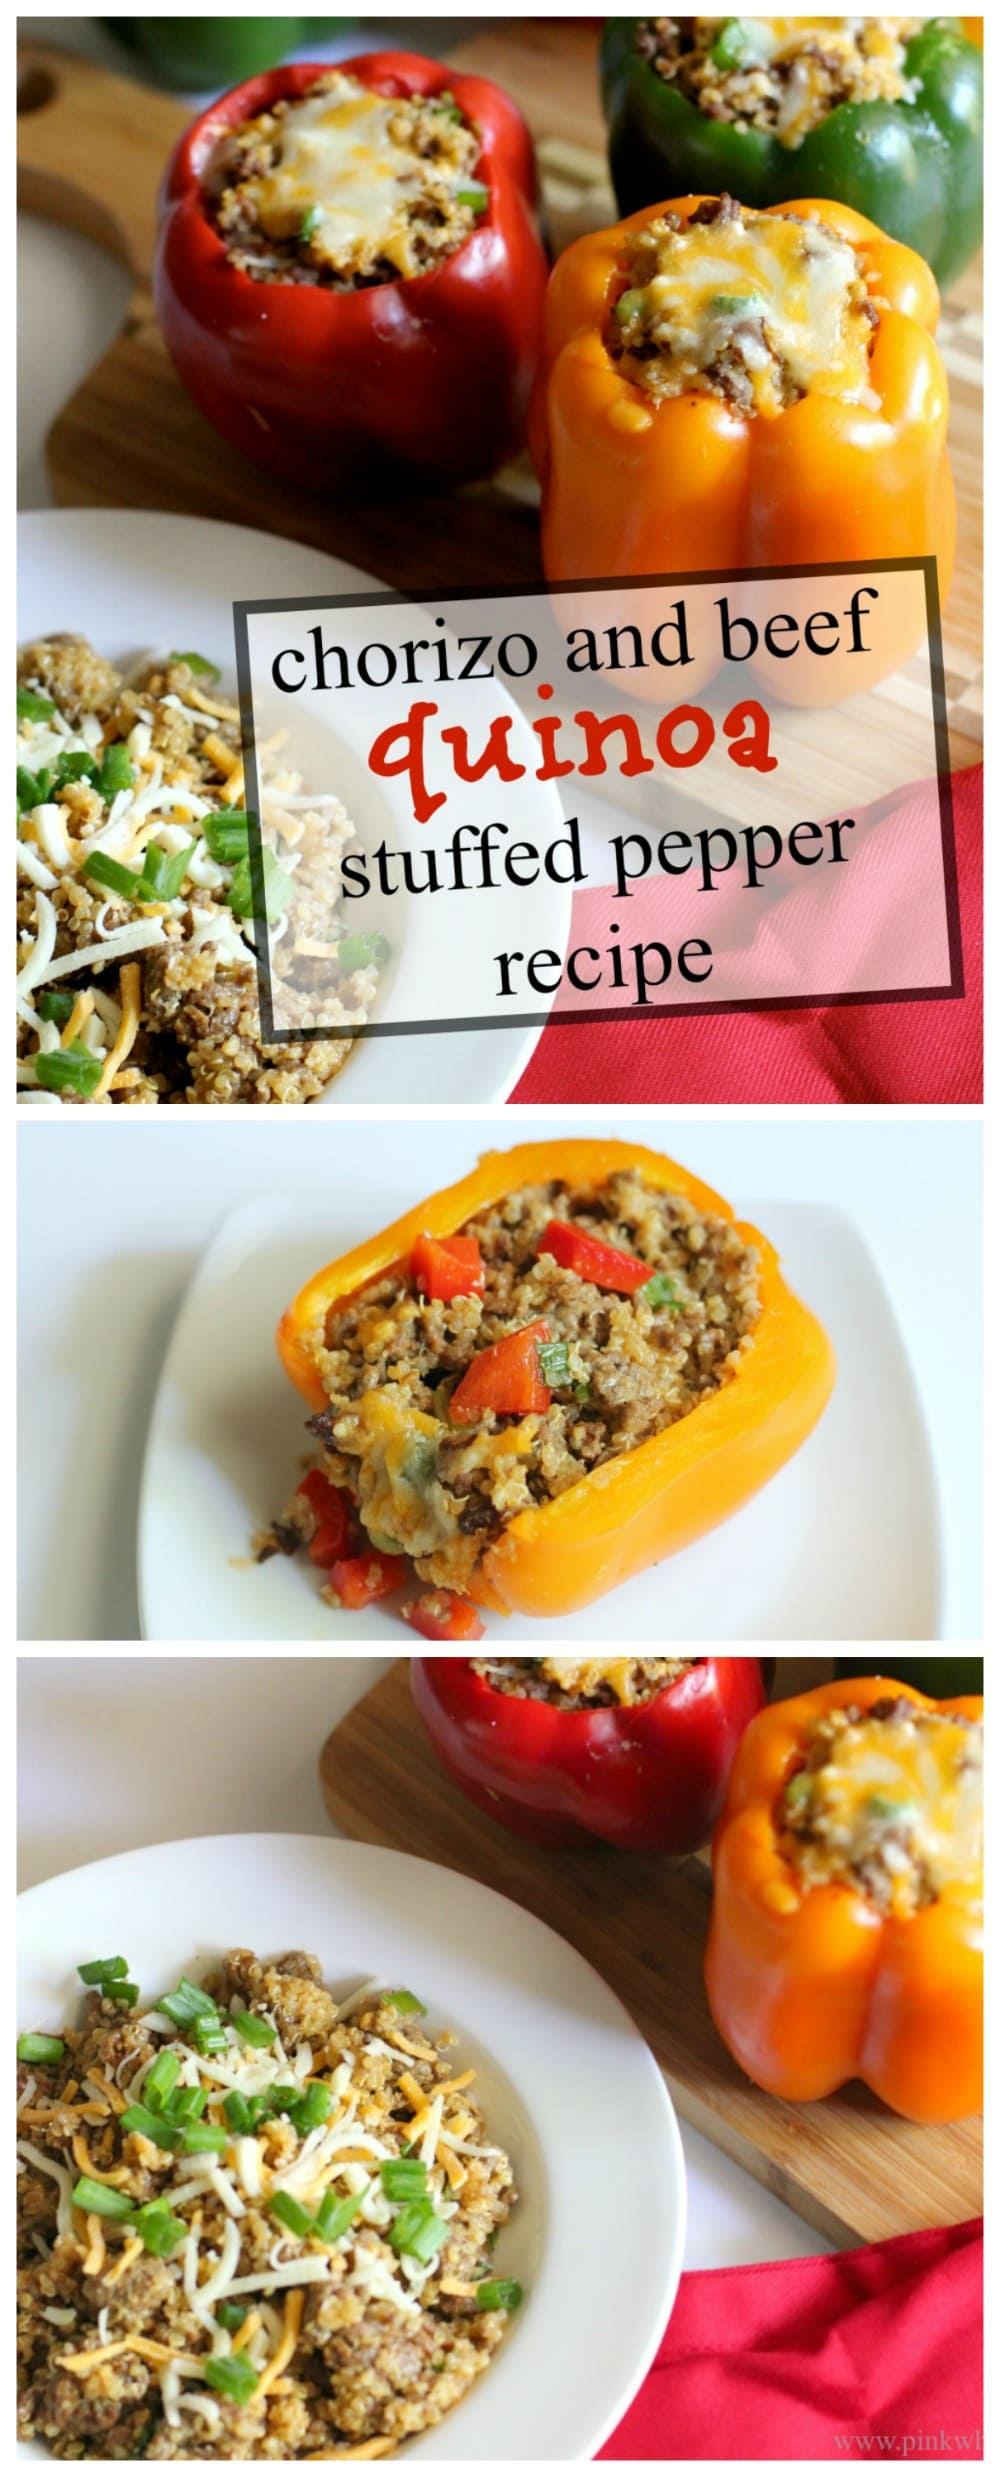 Chorizo and beef quinoa stuffed pepper recipe